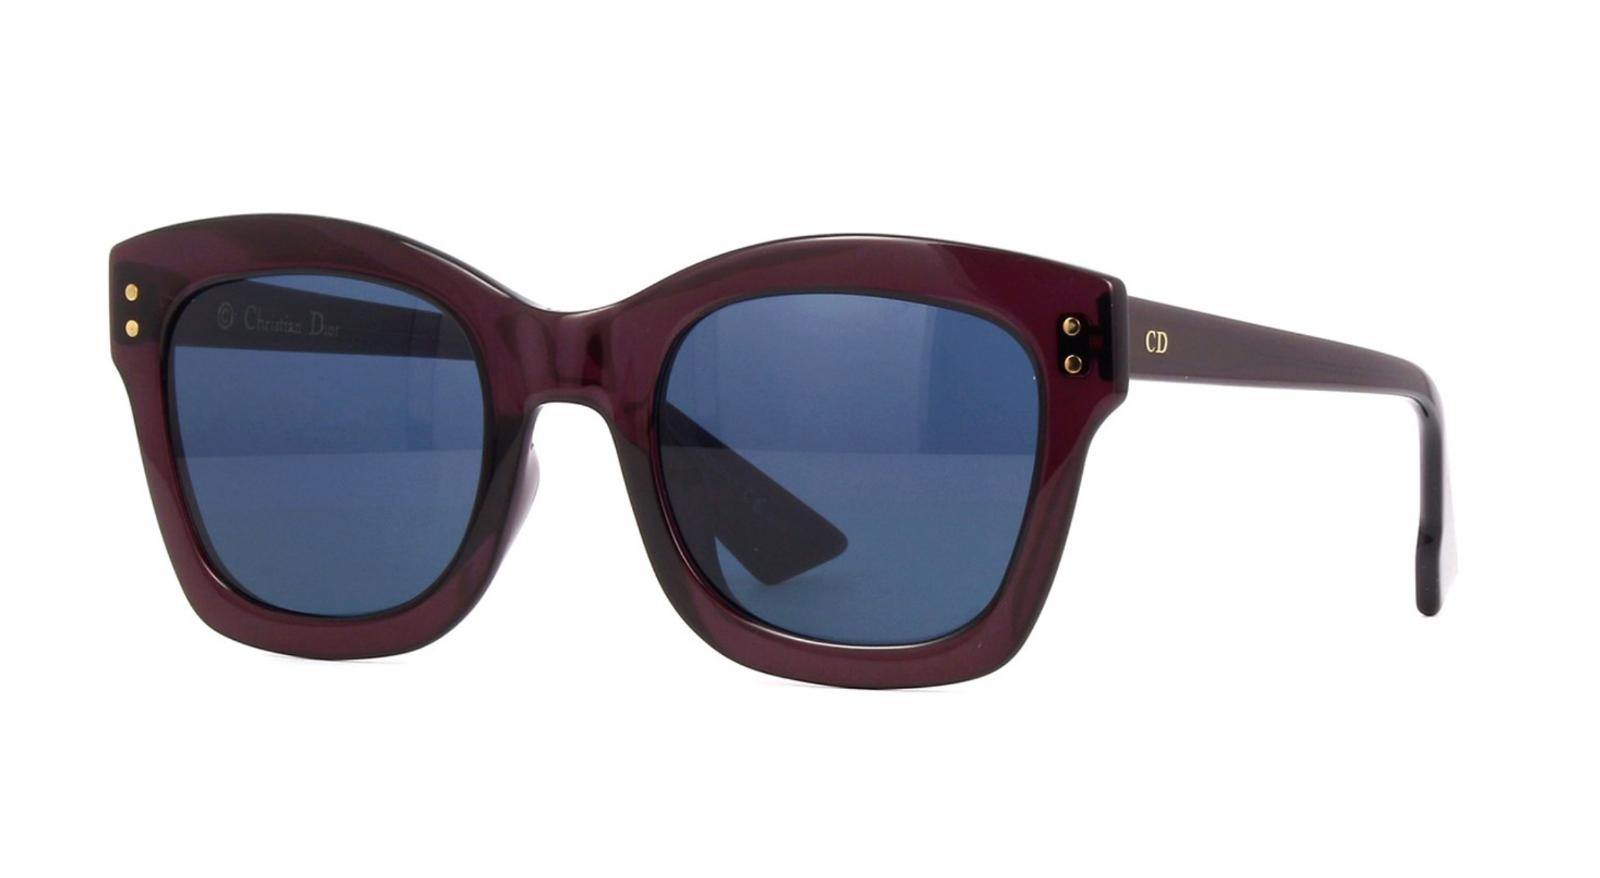 f9a19404f6c Christian Diorizon2 0T7KU Sunglasses Plum Frame Blue Lenses 51mm - £152.49  GBP · Advanced search for Christian Dior Sunglasses